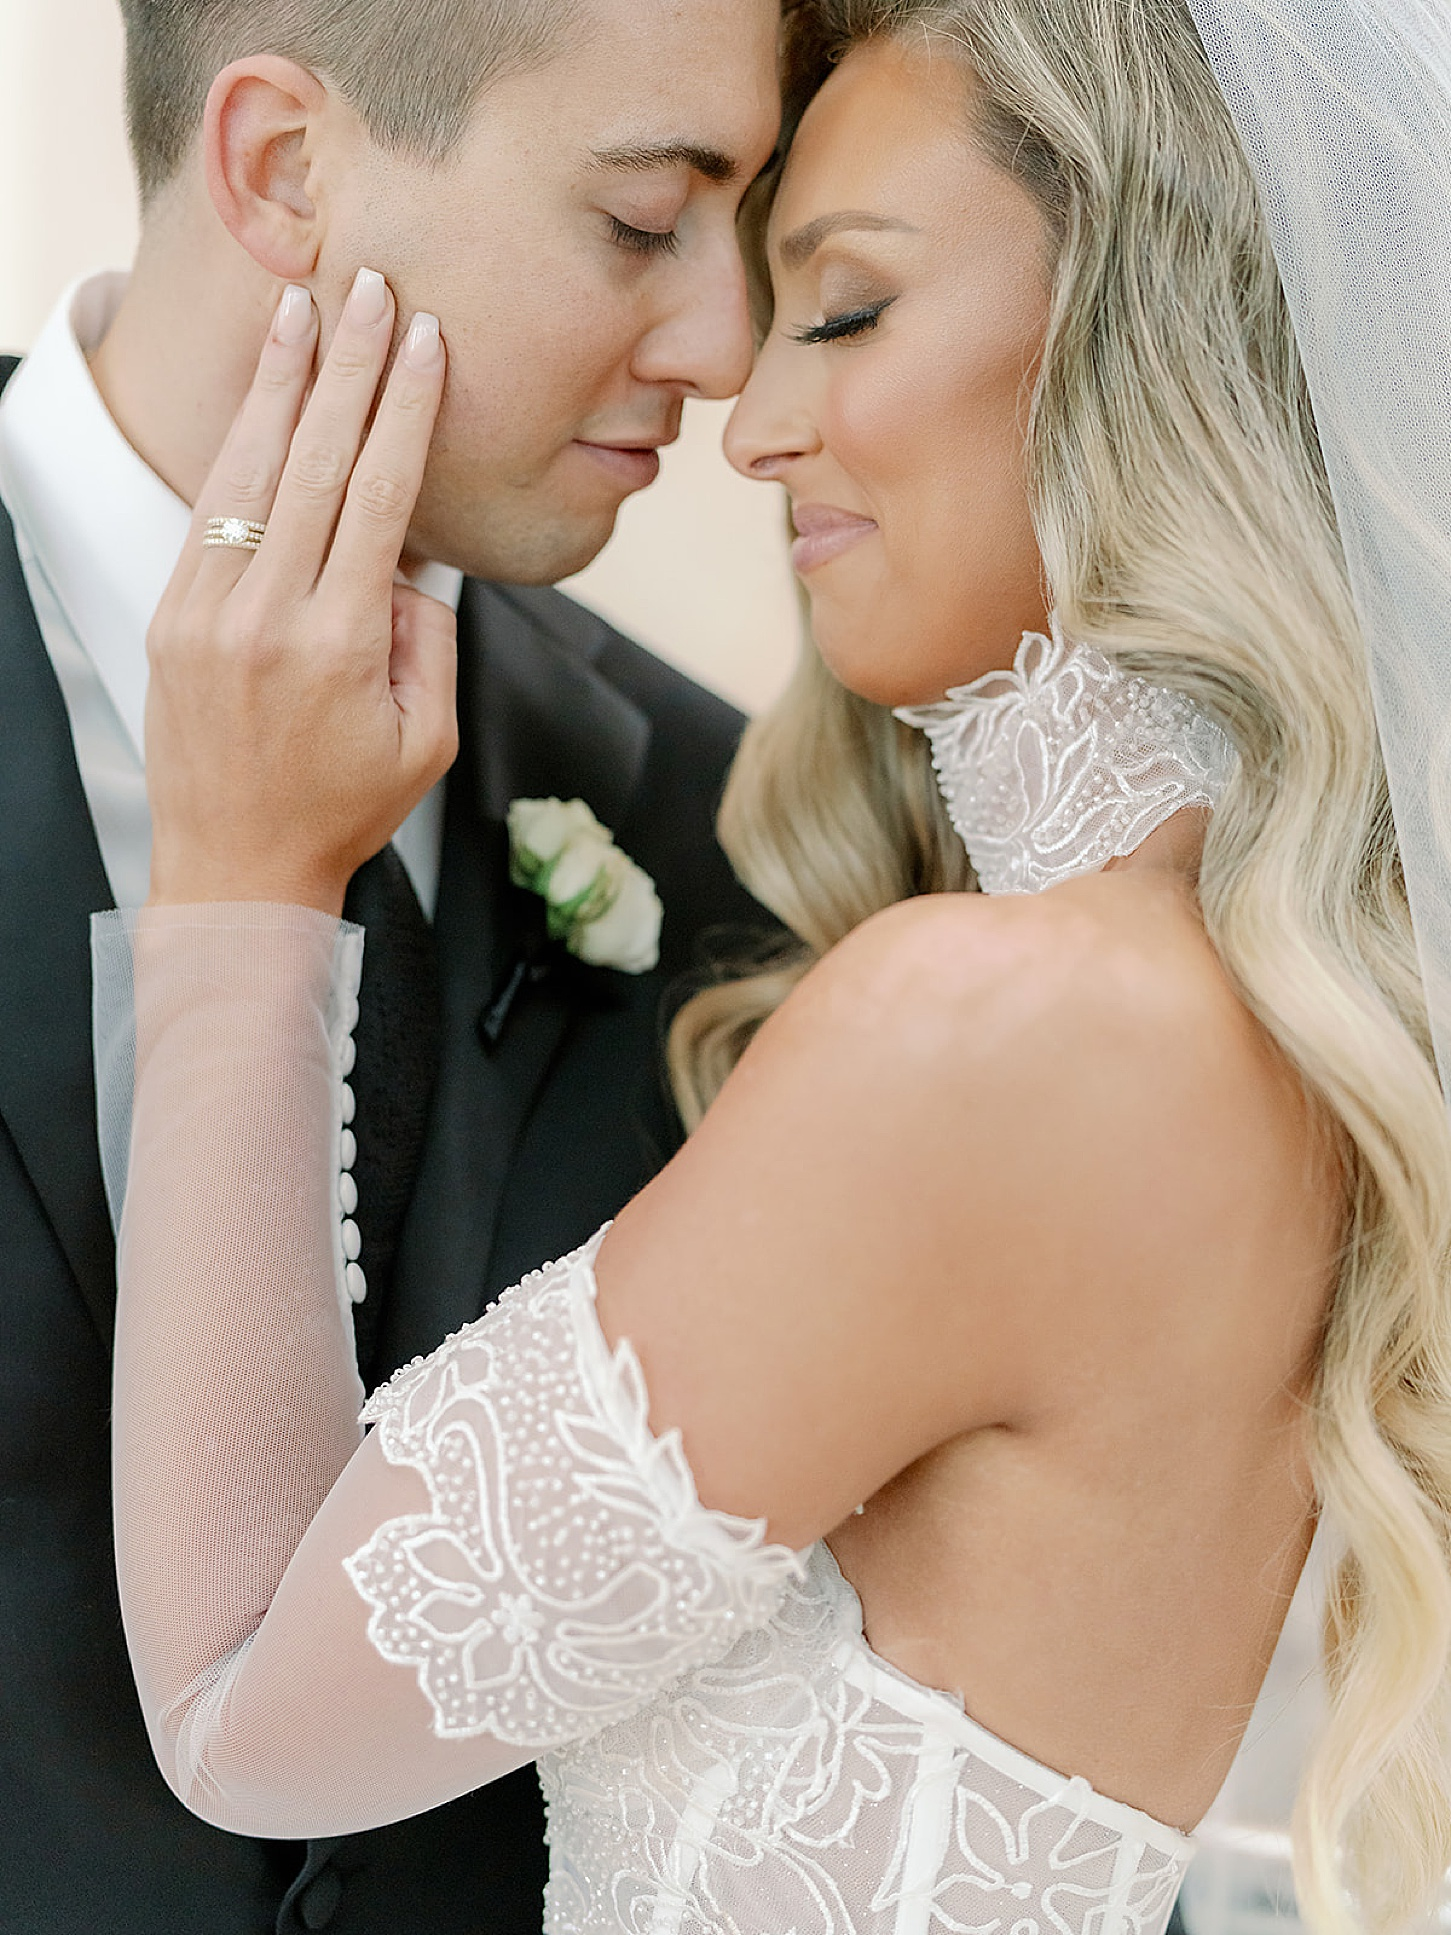 Atlantic City Wedding Photography Studio by Magdalena Studios Lexy Cha 0062